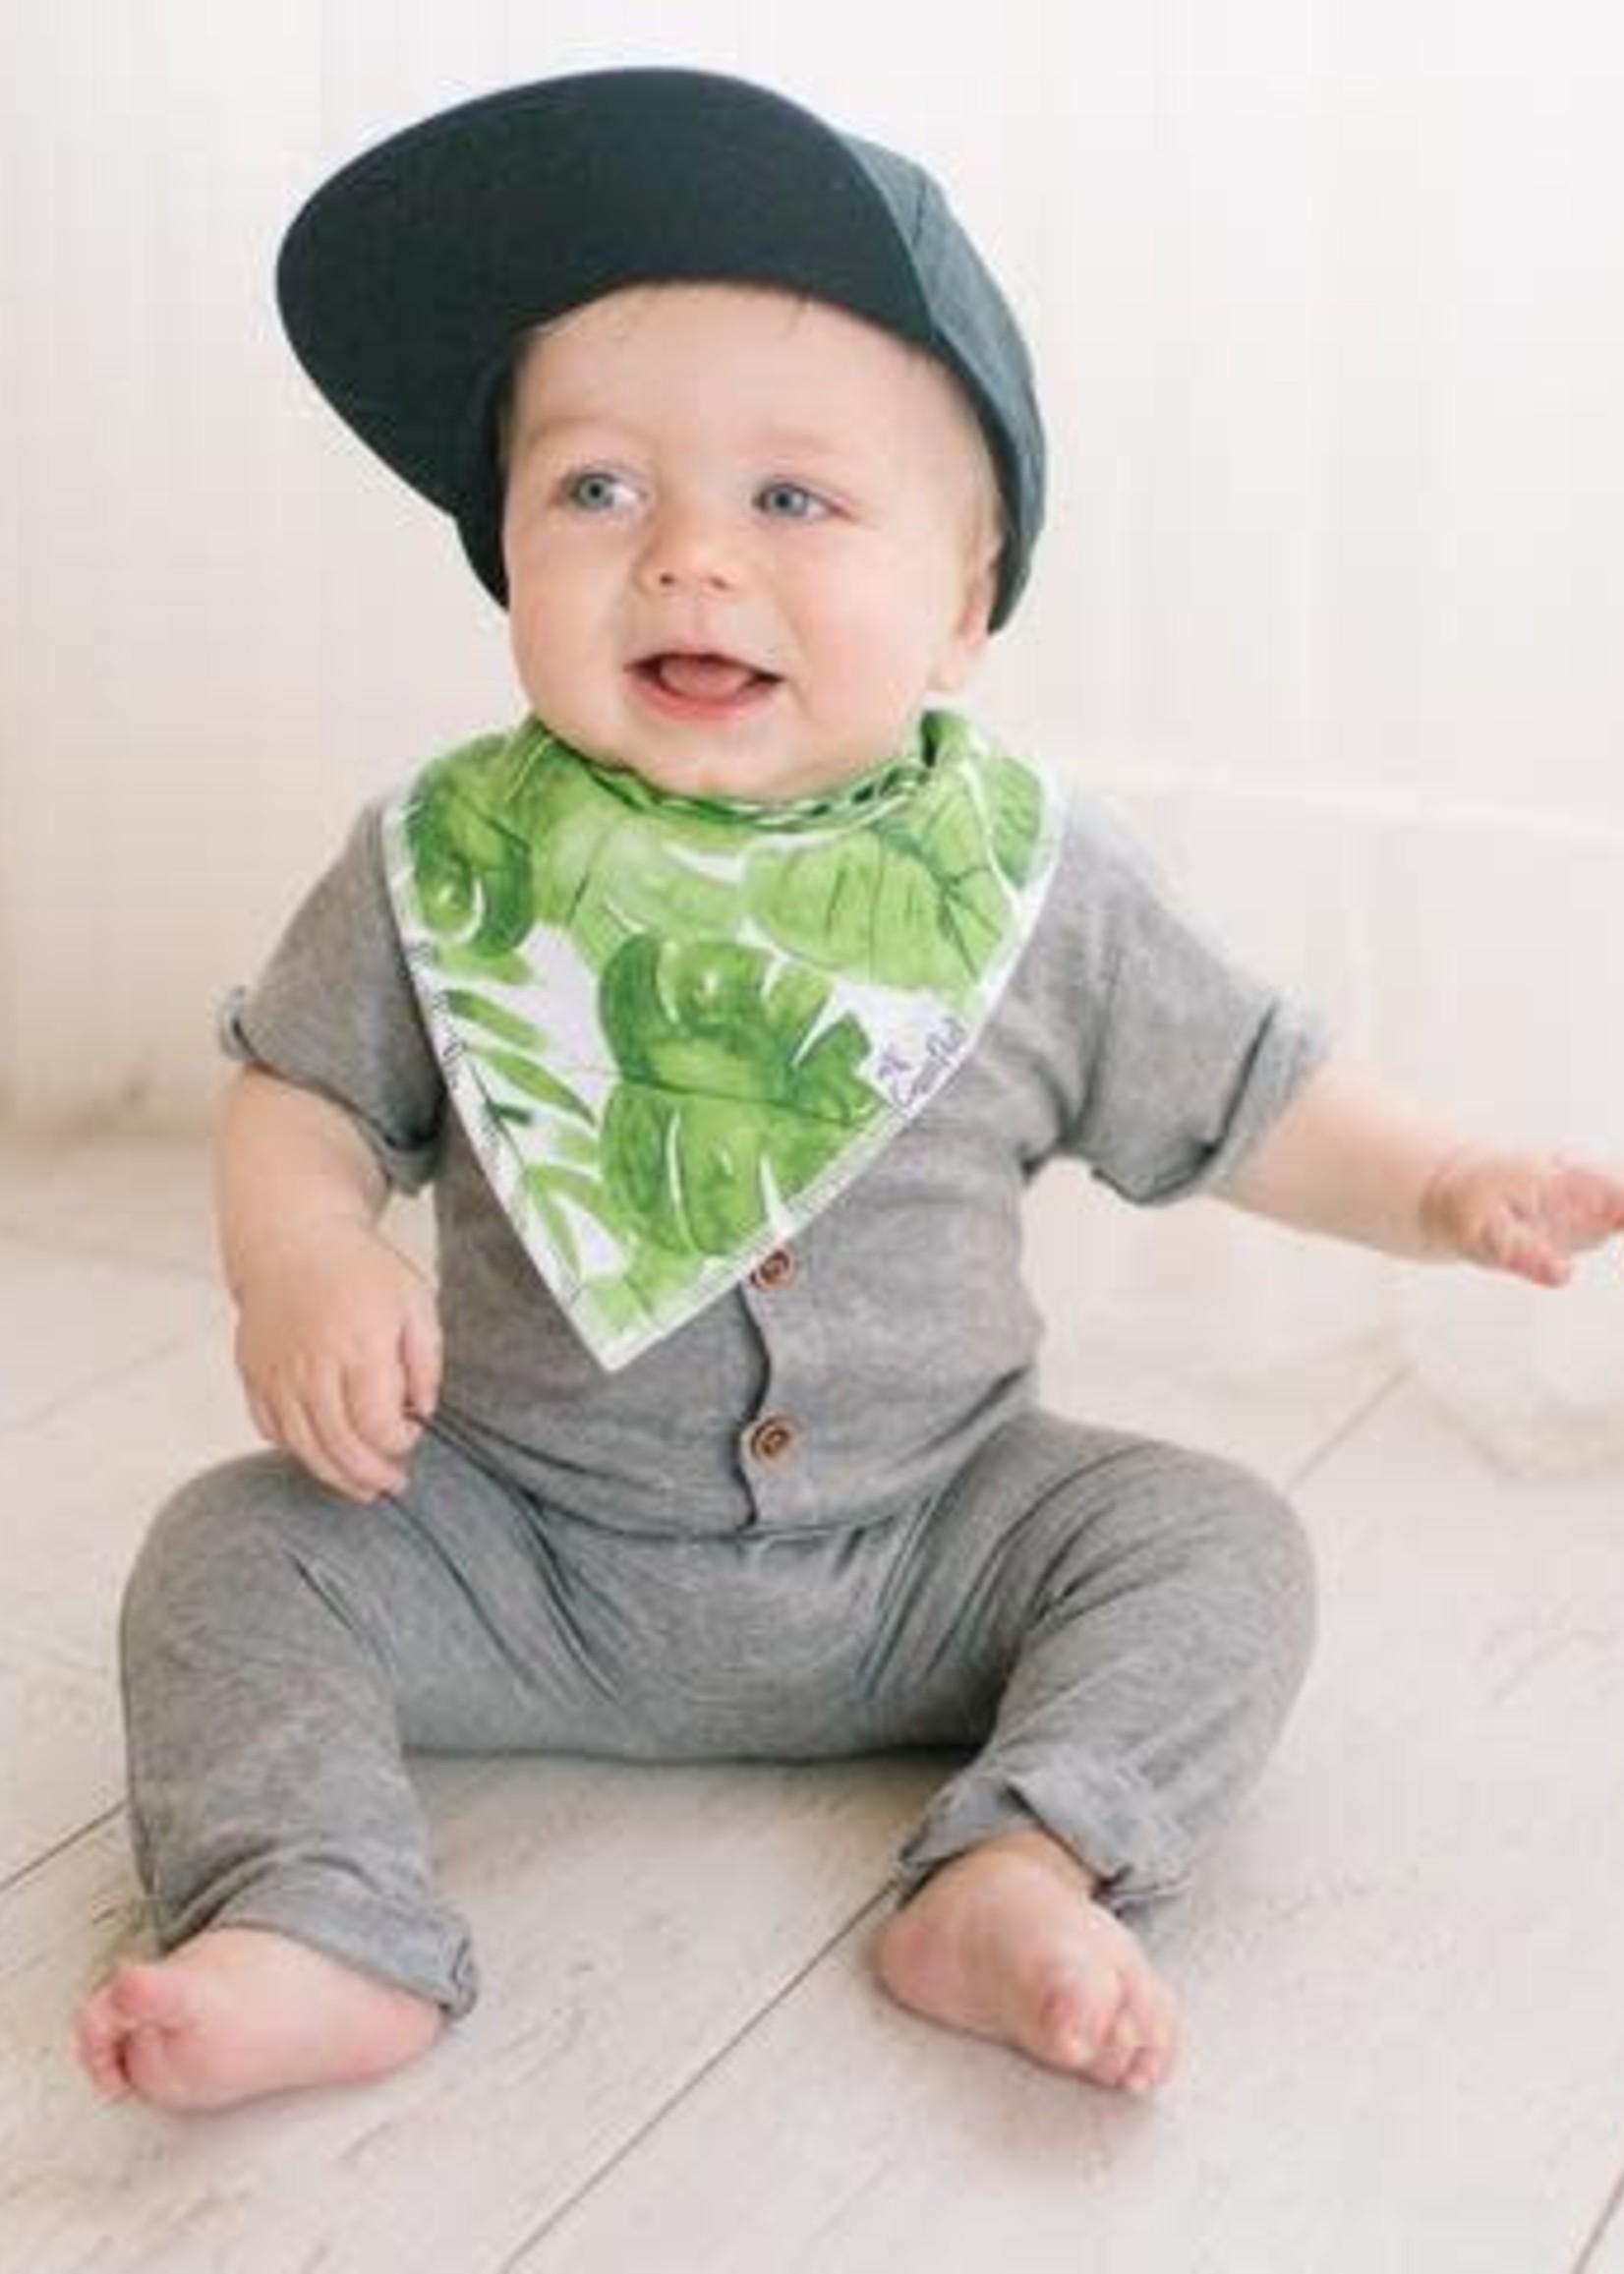 COPPER PEARL 4-Pack Bandana Baby Bibs NOAH